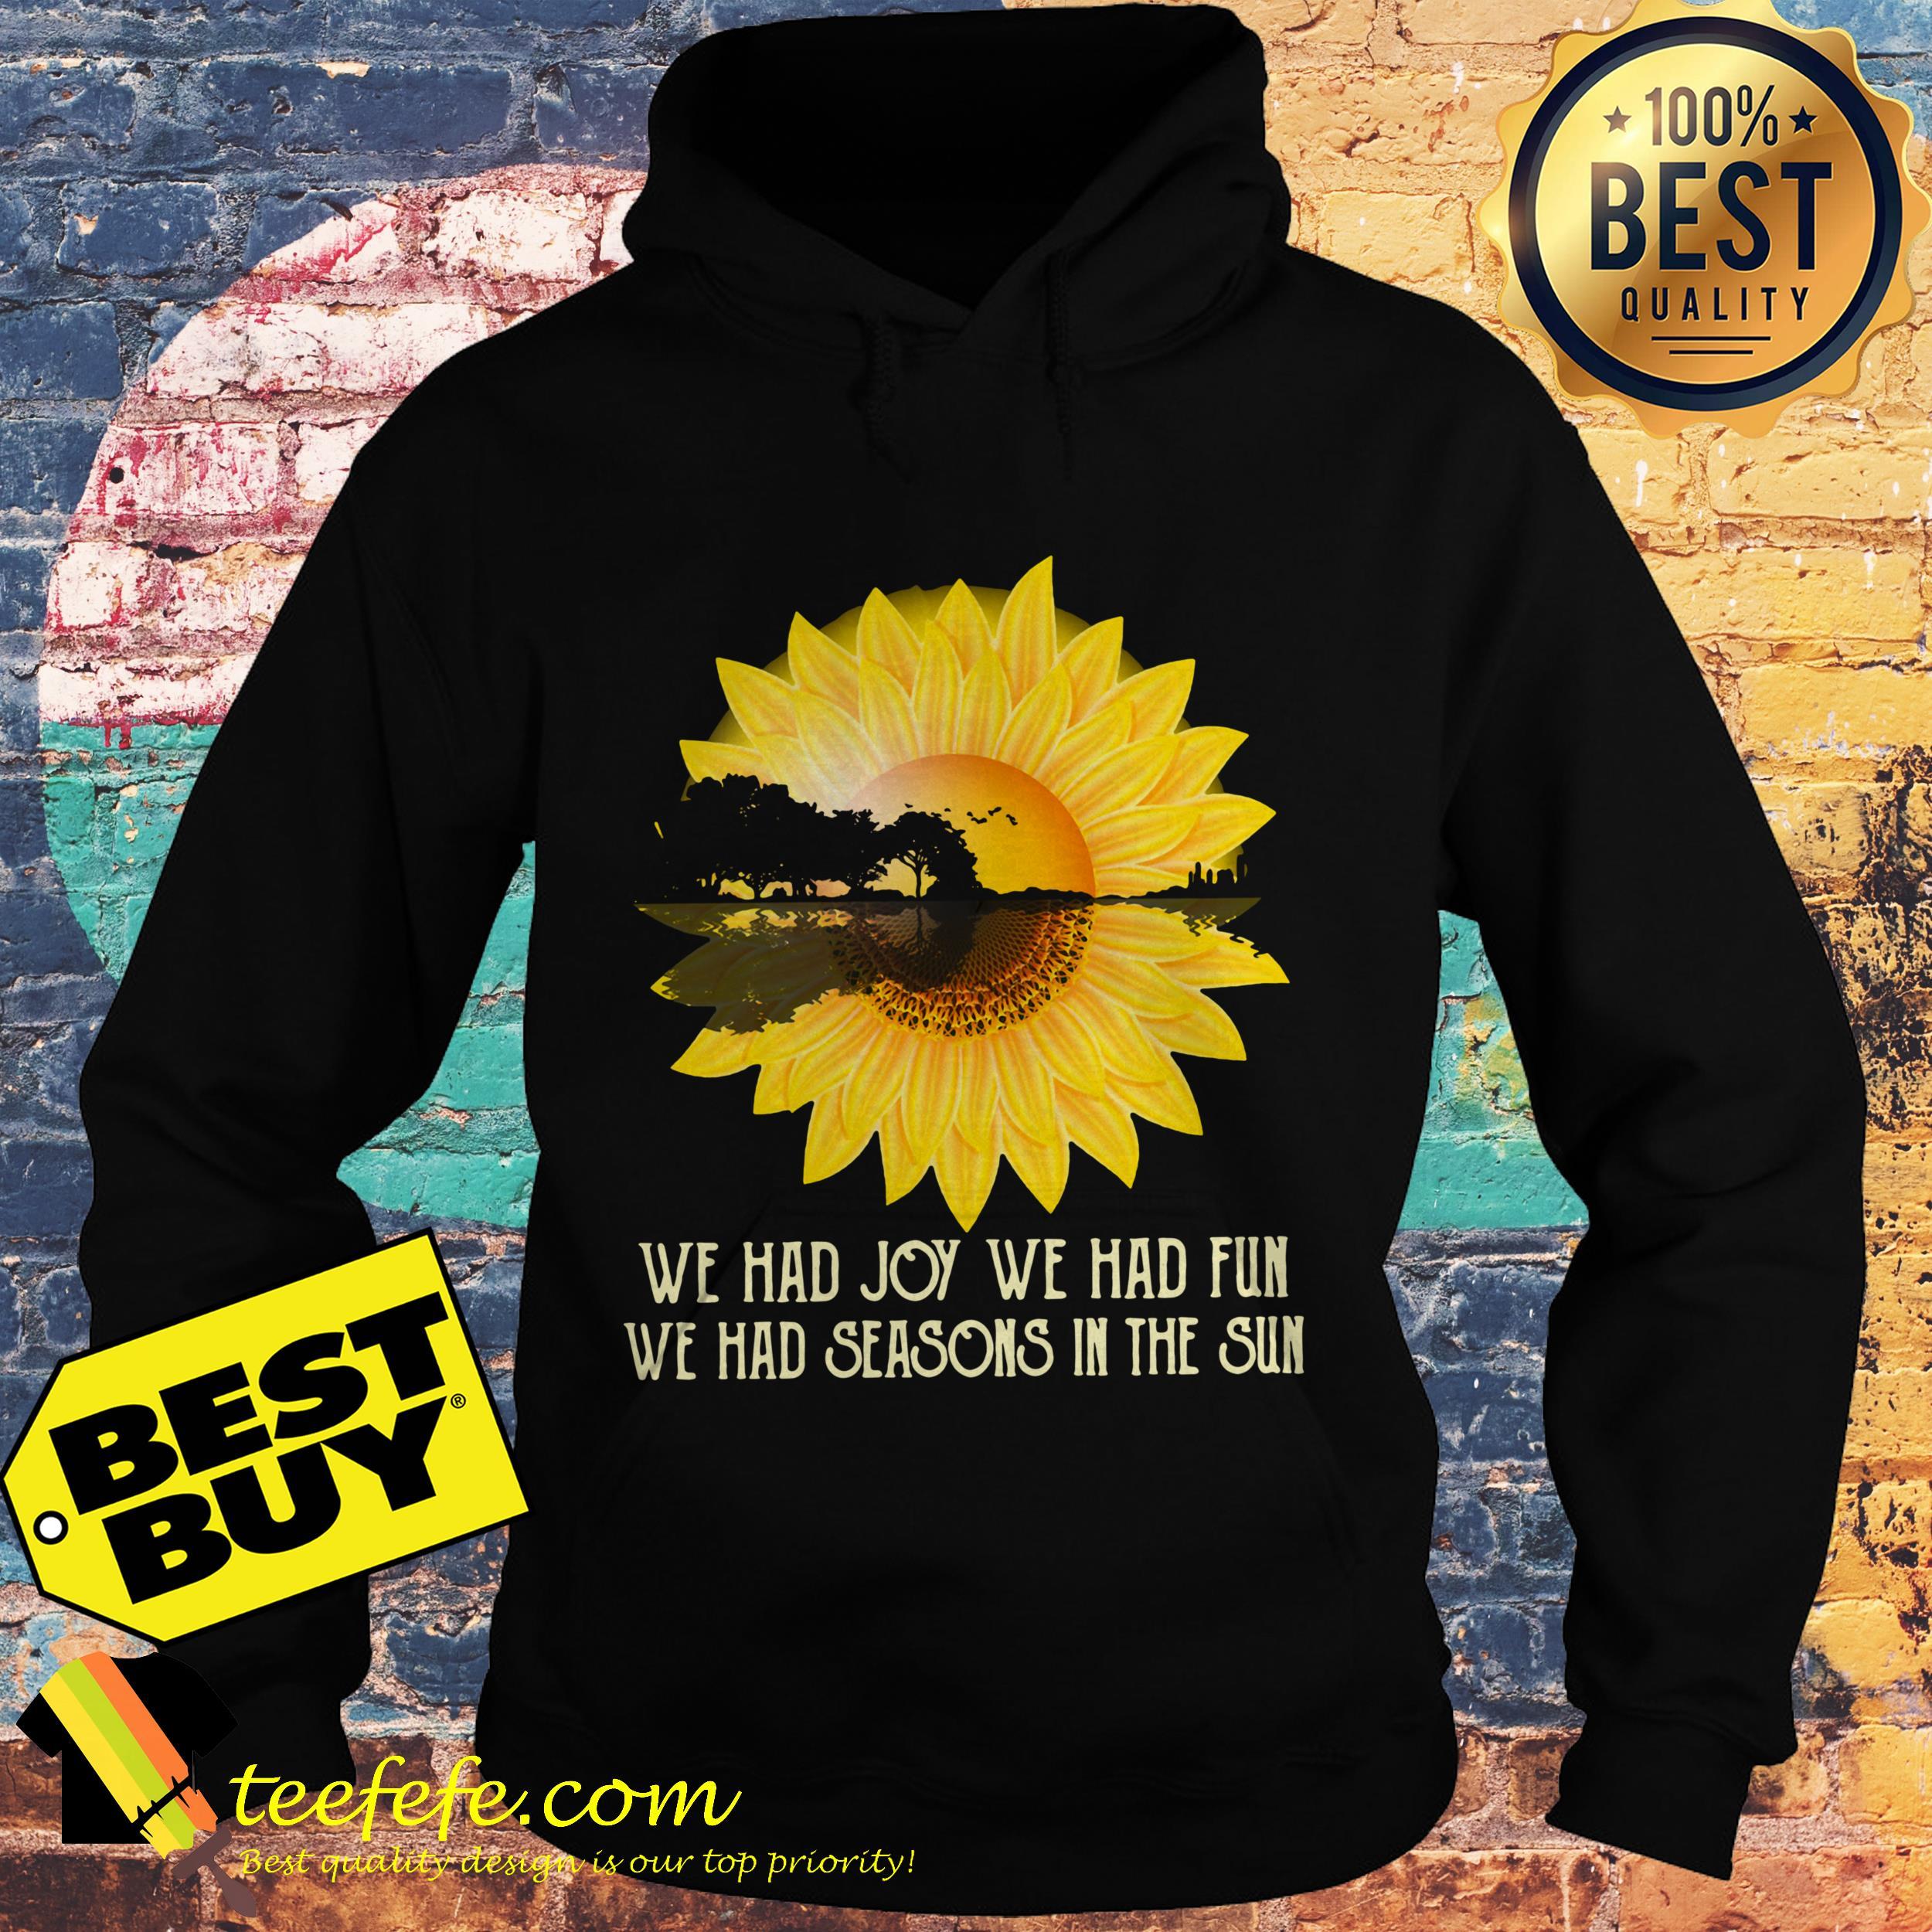 Sunflower Guitar lake shadow We had joy we had fun hoodie